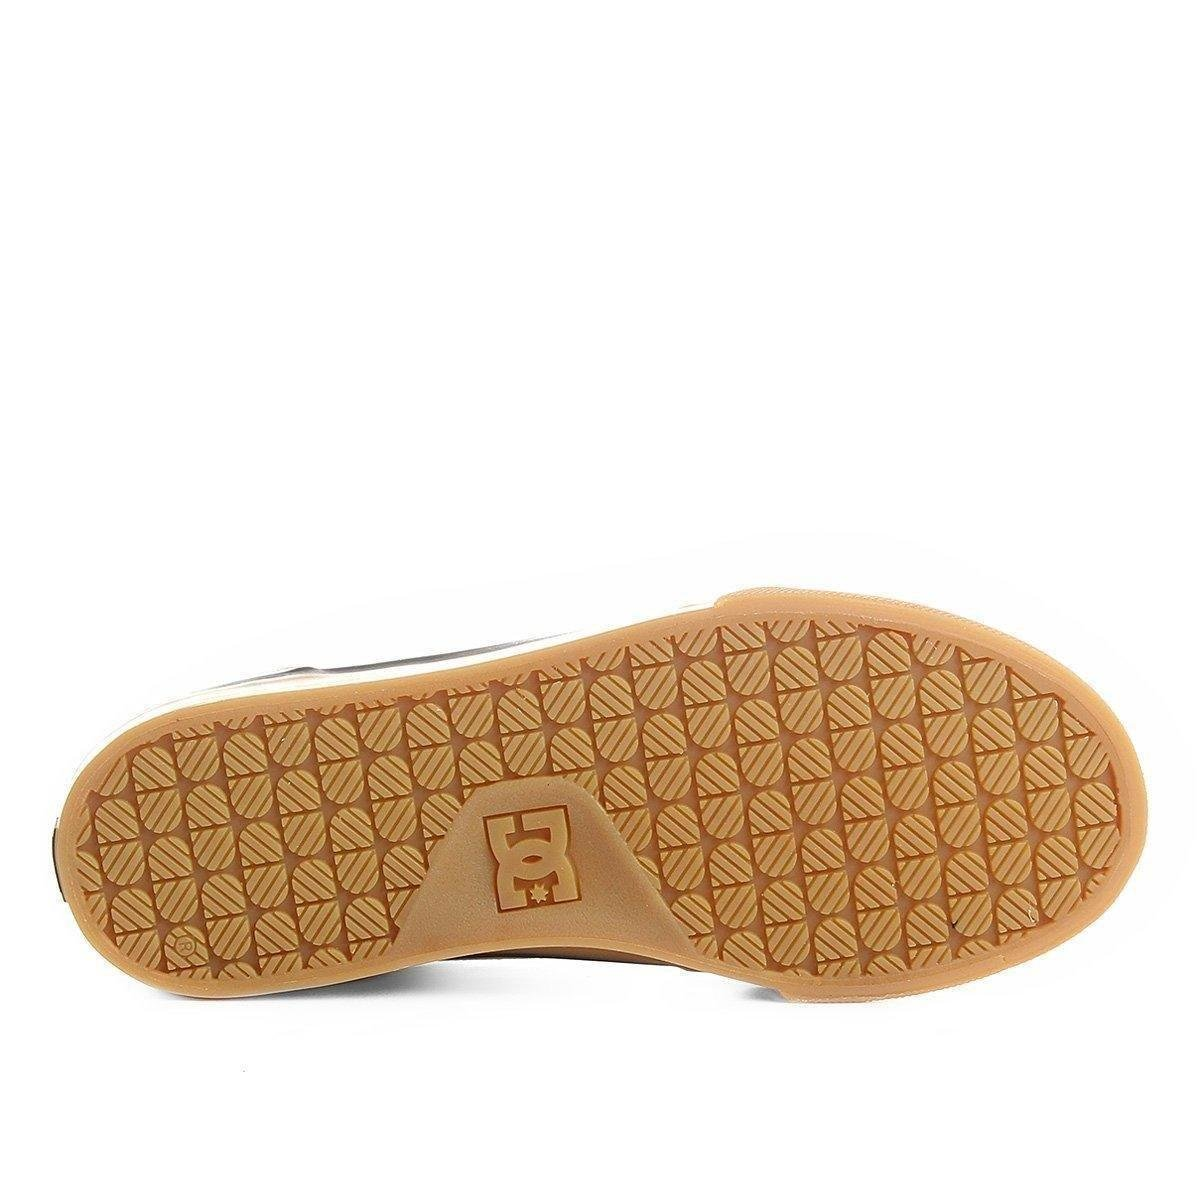 Tênis Bege Bege DC Bege Tênis Shoes Shoes DC Episo Shoes Tênis Tênis Episo DC Episo vfxwn